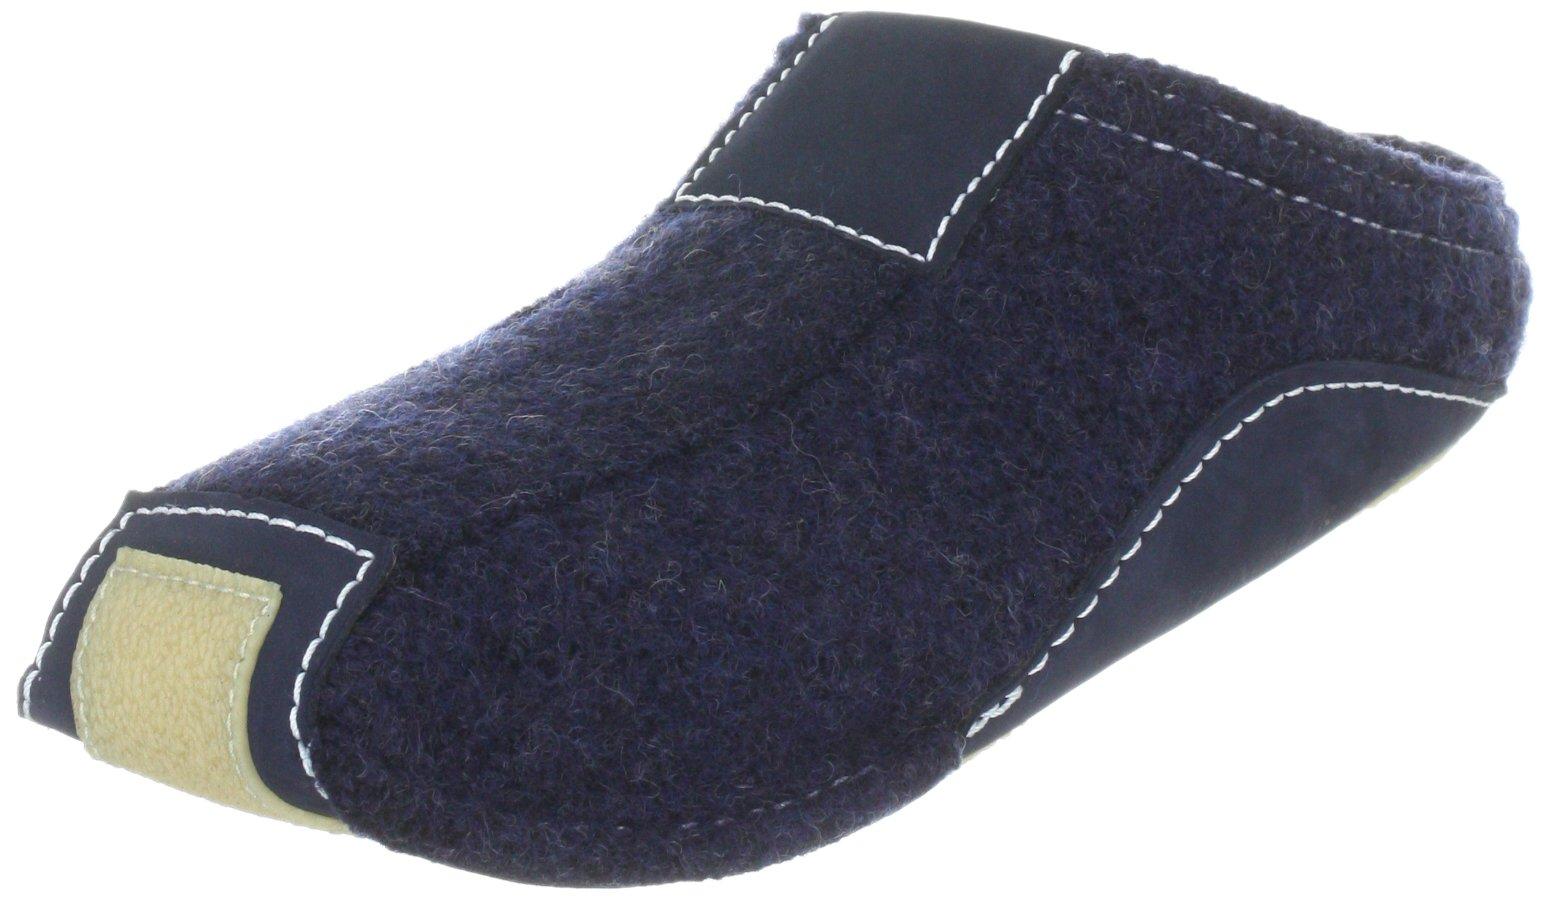 Haflinger 411001 Slippers Pocahontas, kapitän, Gr 46